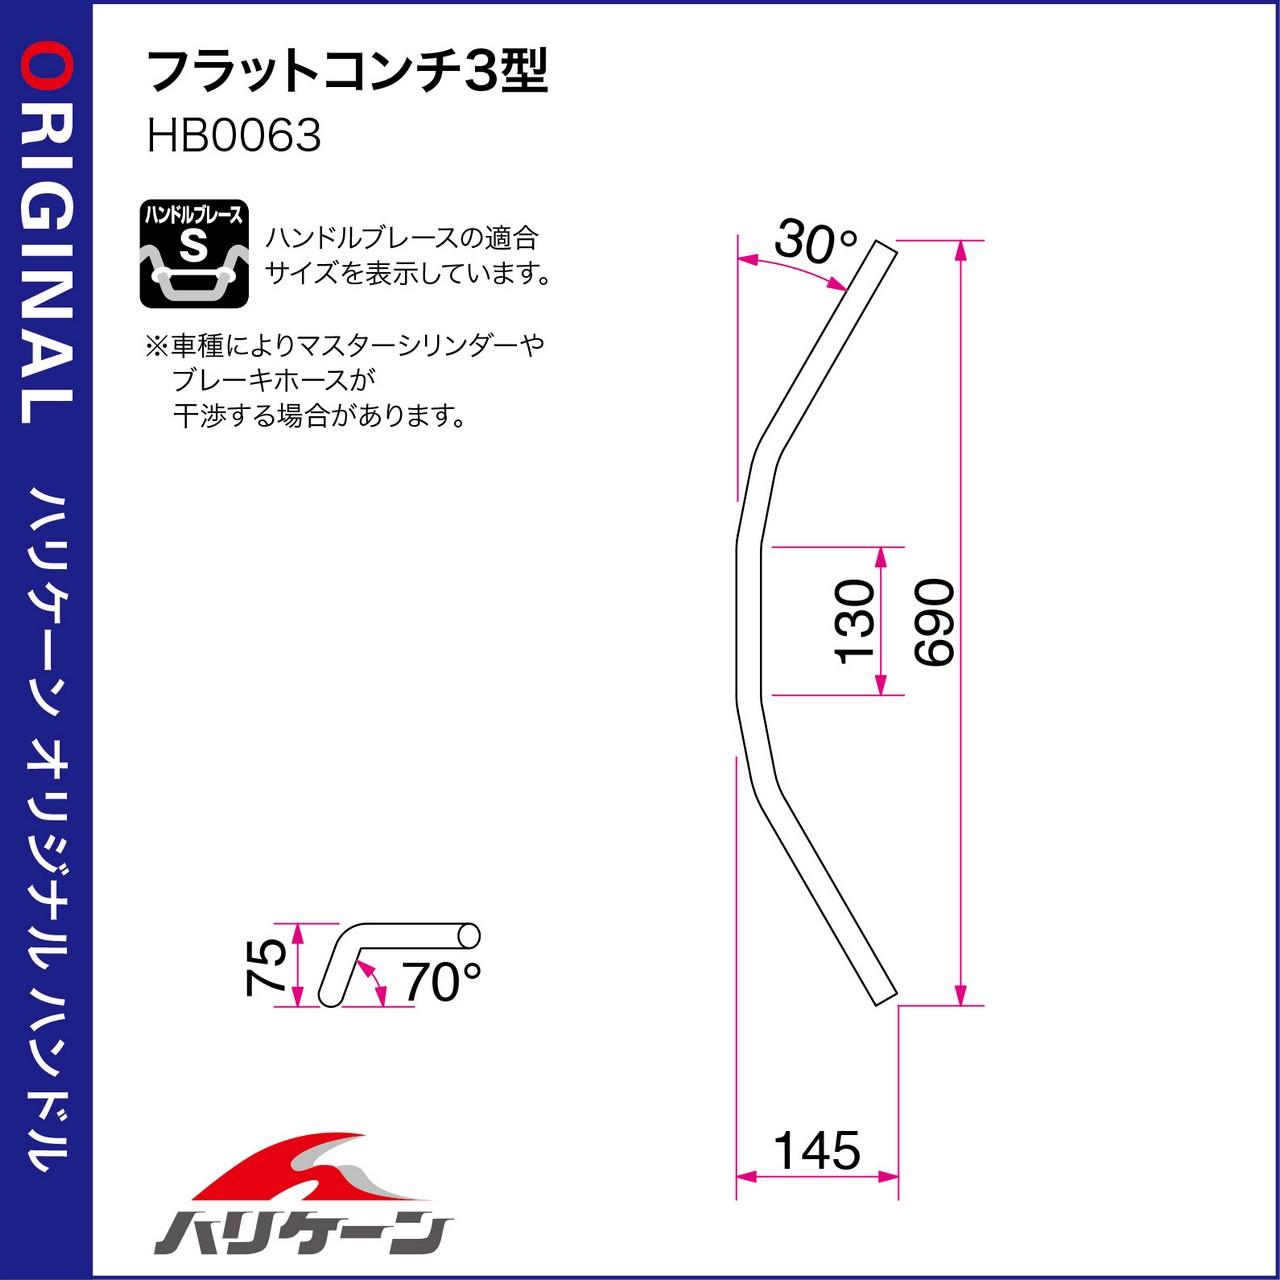 【HURRICANE】Flat Continental Type 3 Φ 7/8 吋 鋼製把手 - 「Webike-摩托百貨」